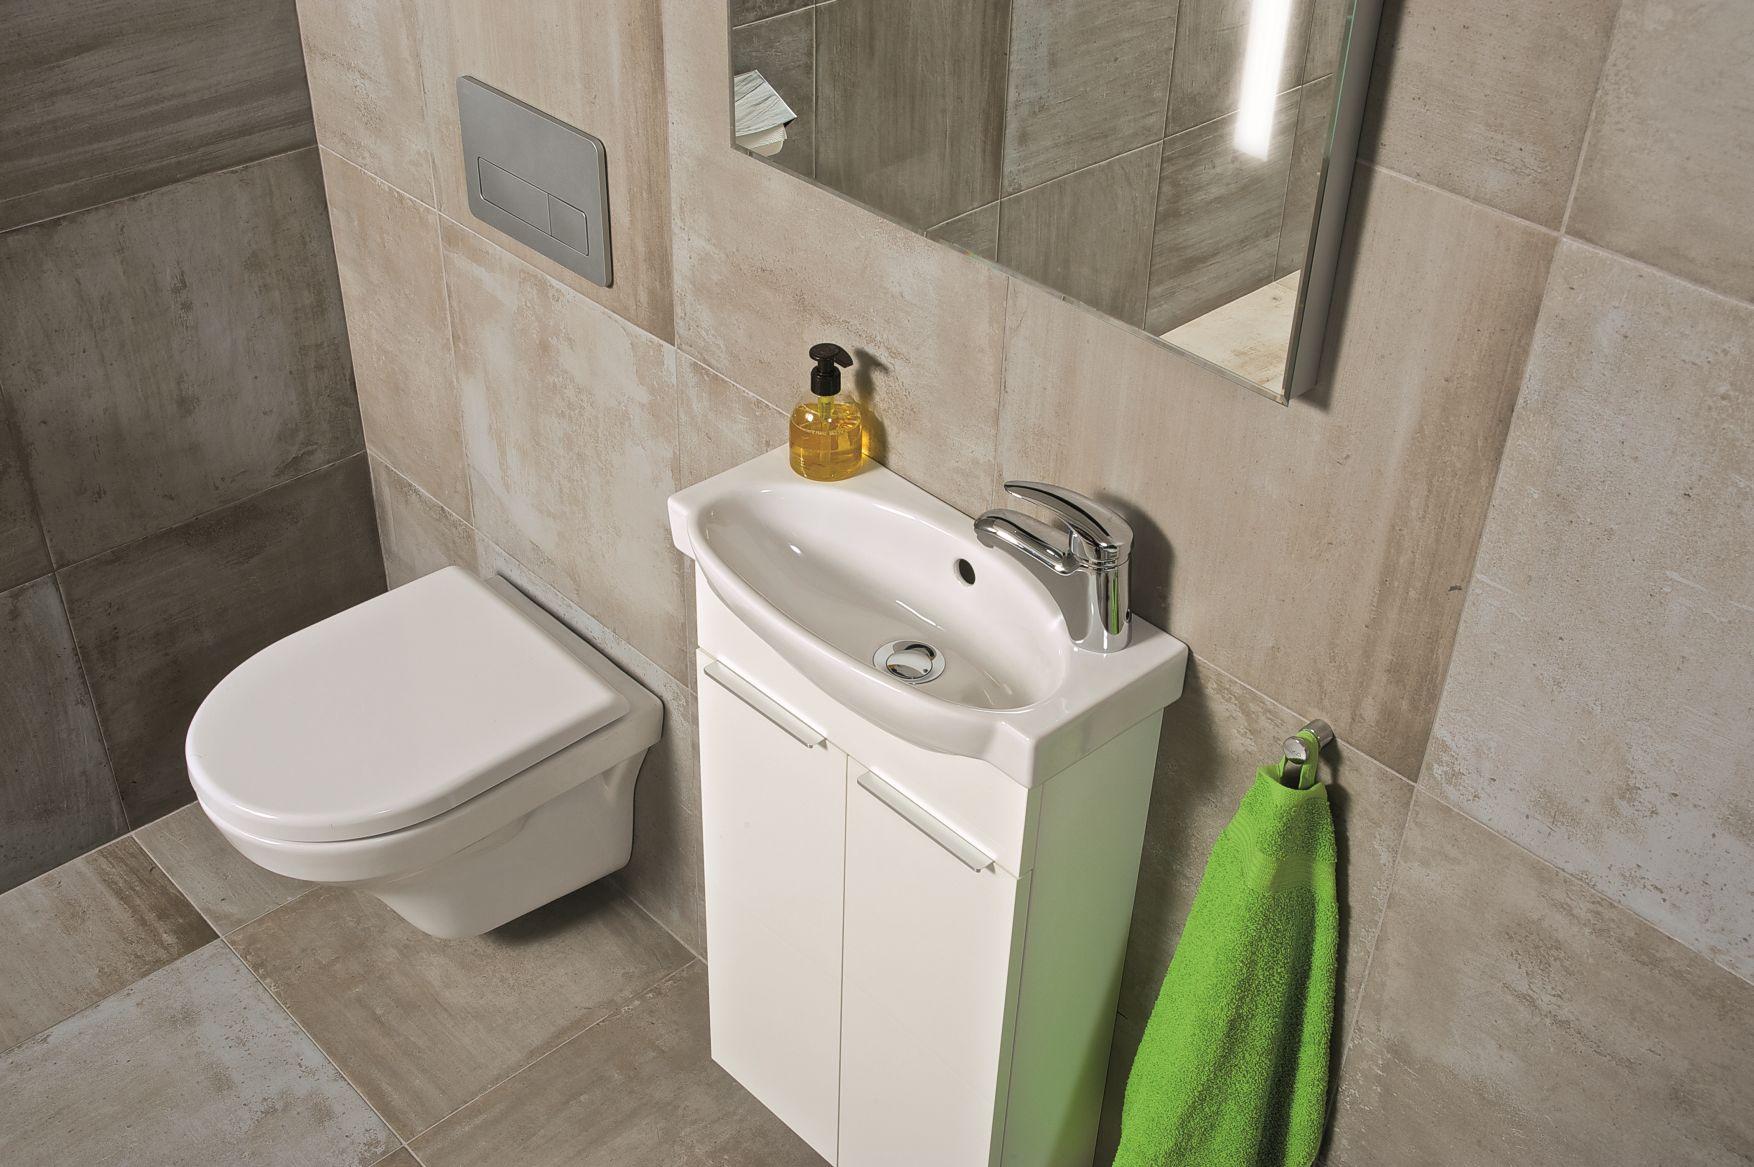 14zavesna-toaleta-tigo.jpg